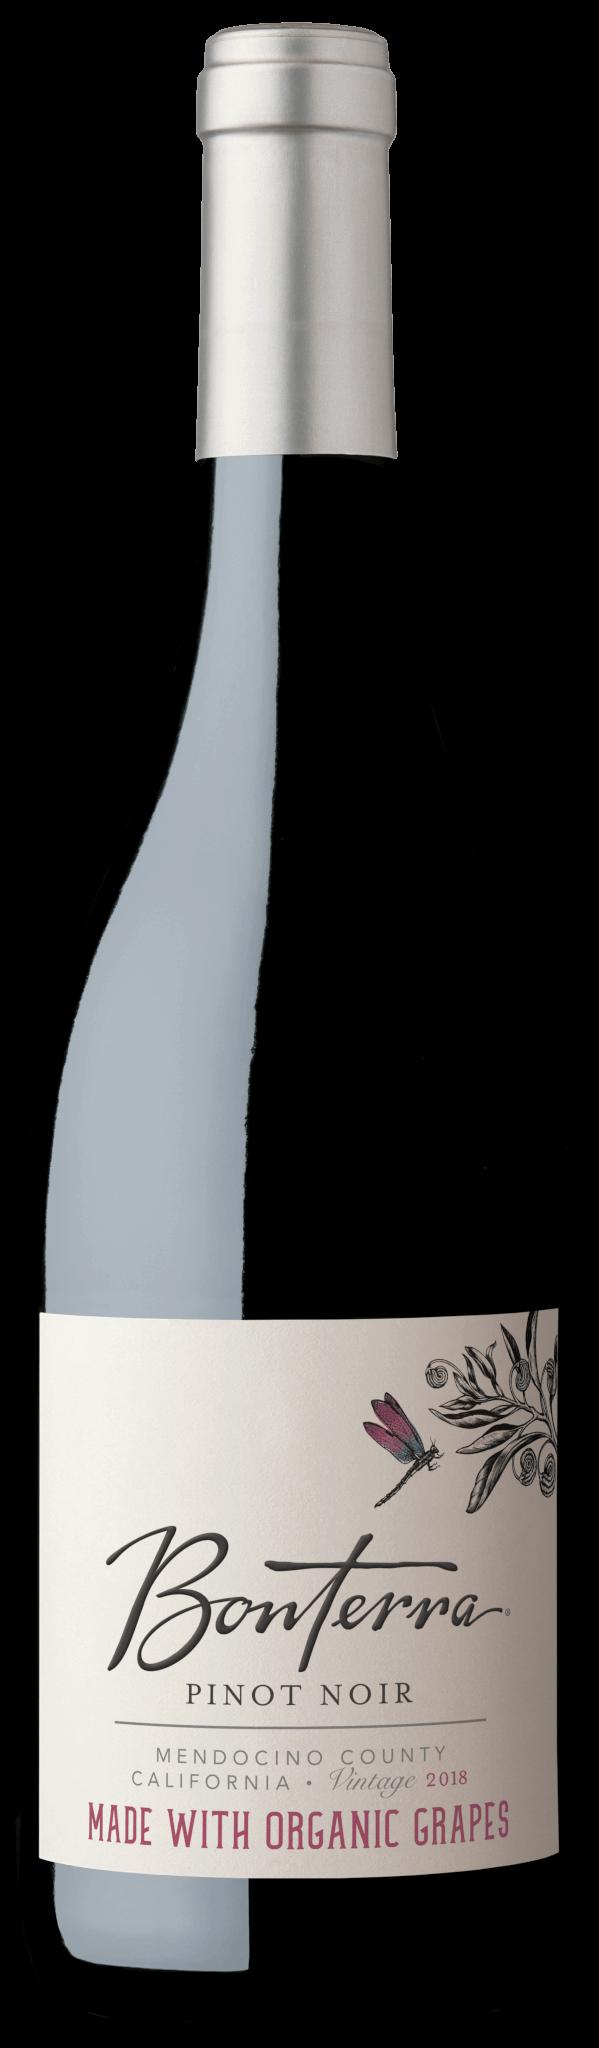 Bonterra Organic Wine Pinot Noir 2018 Bottle Shot